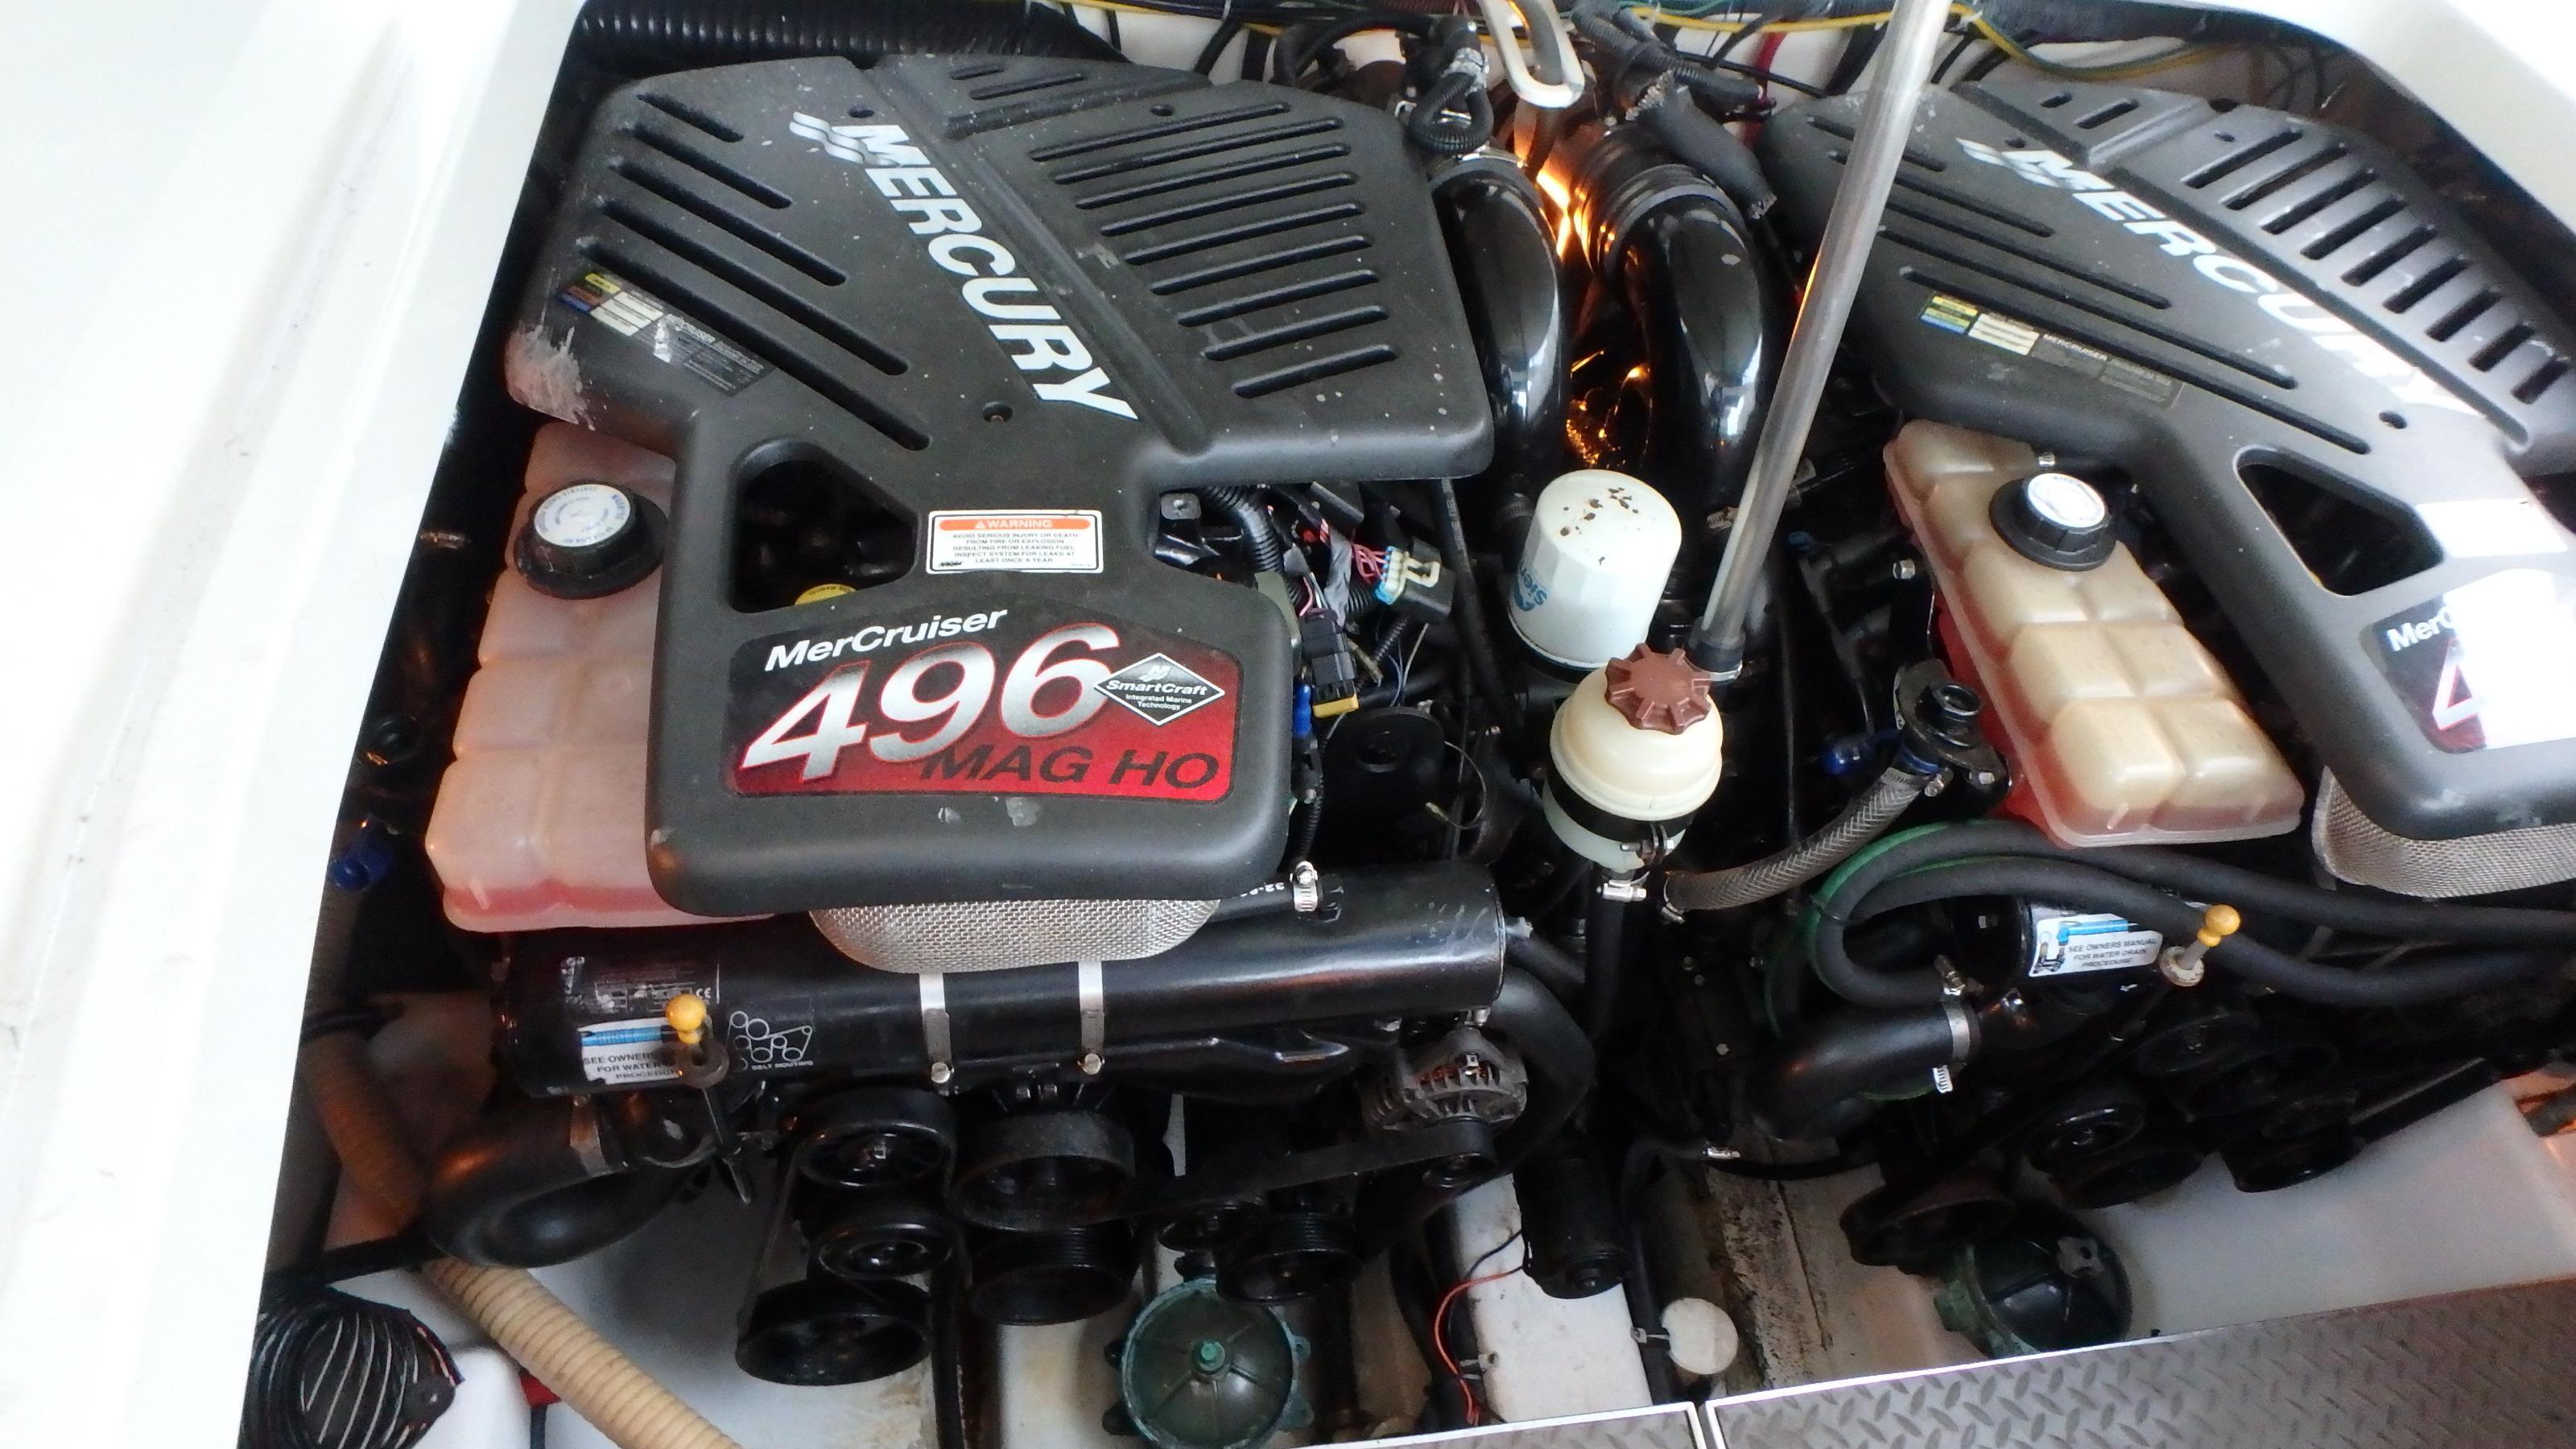 merc service manual 36 ecm diagnostics Array - formula 2006 370 ss very  clean call me 37 yacht for sale in us e1960defa